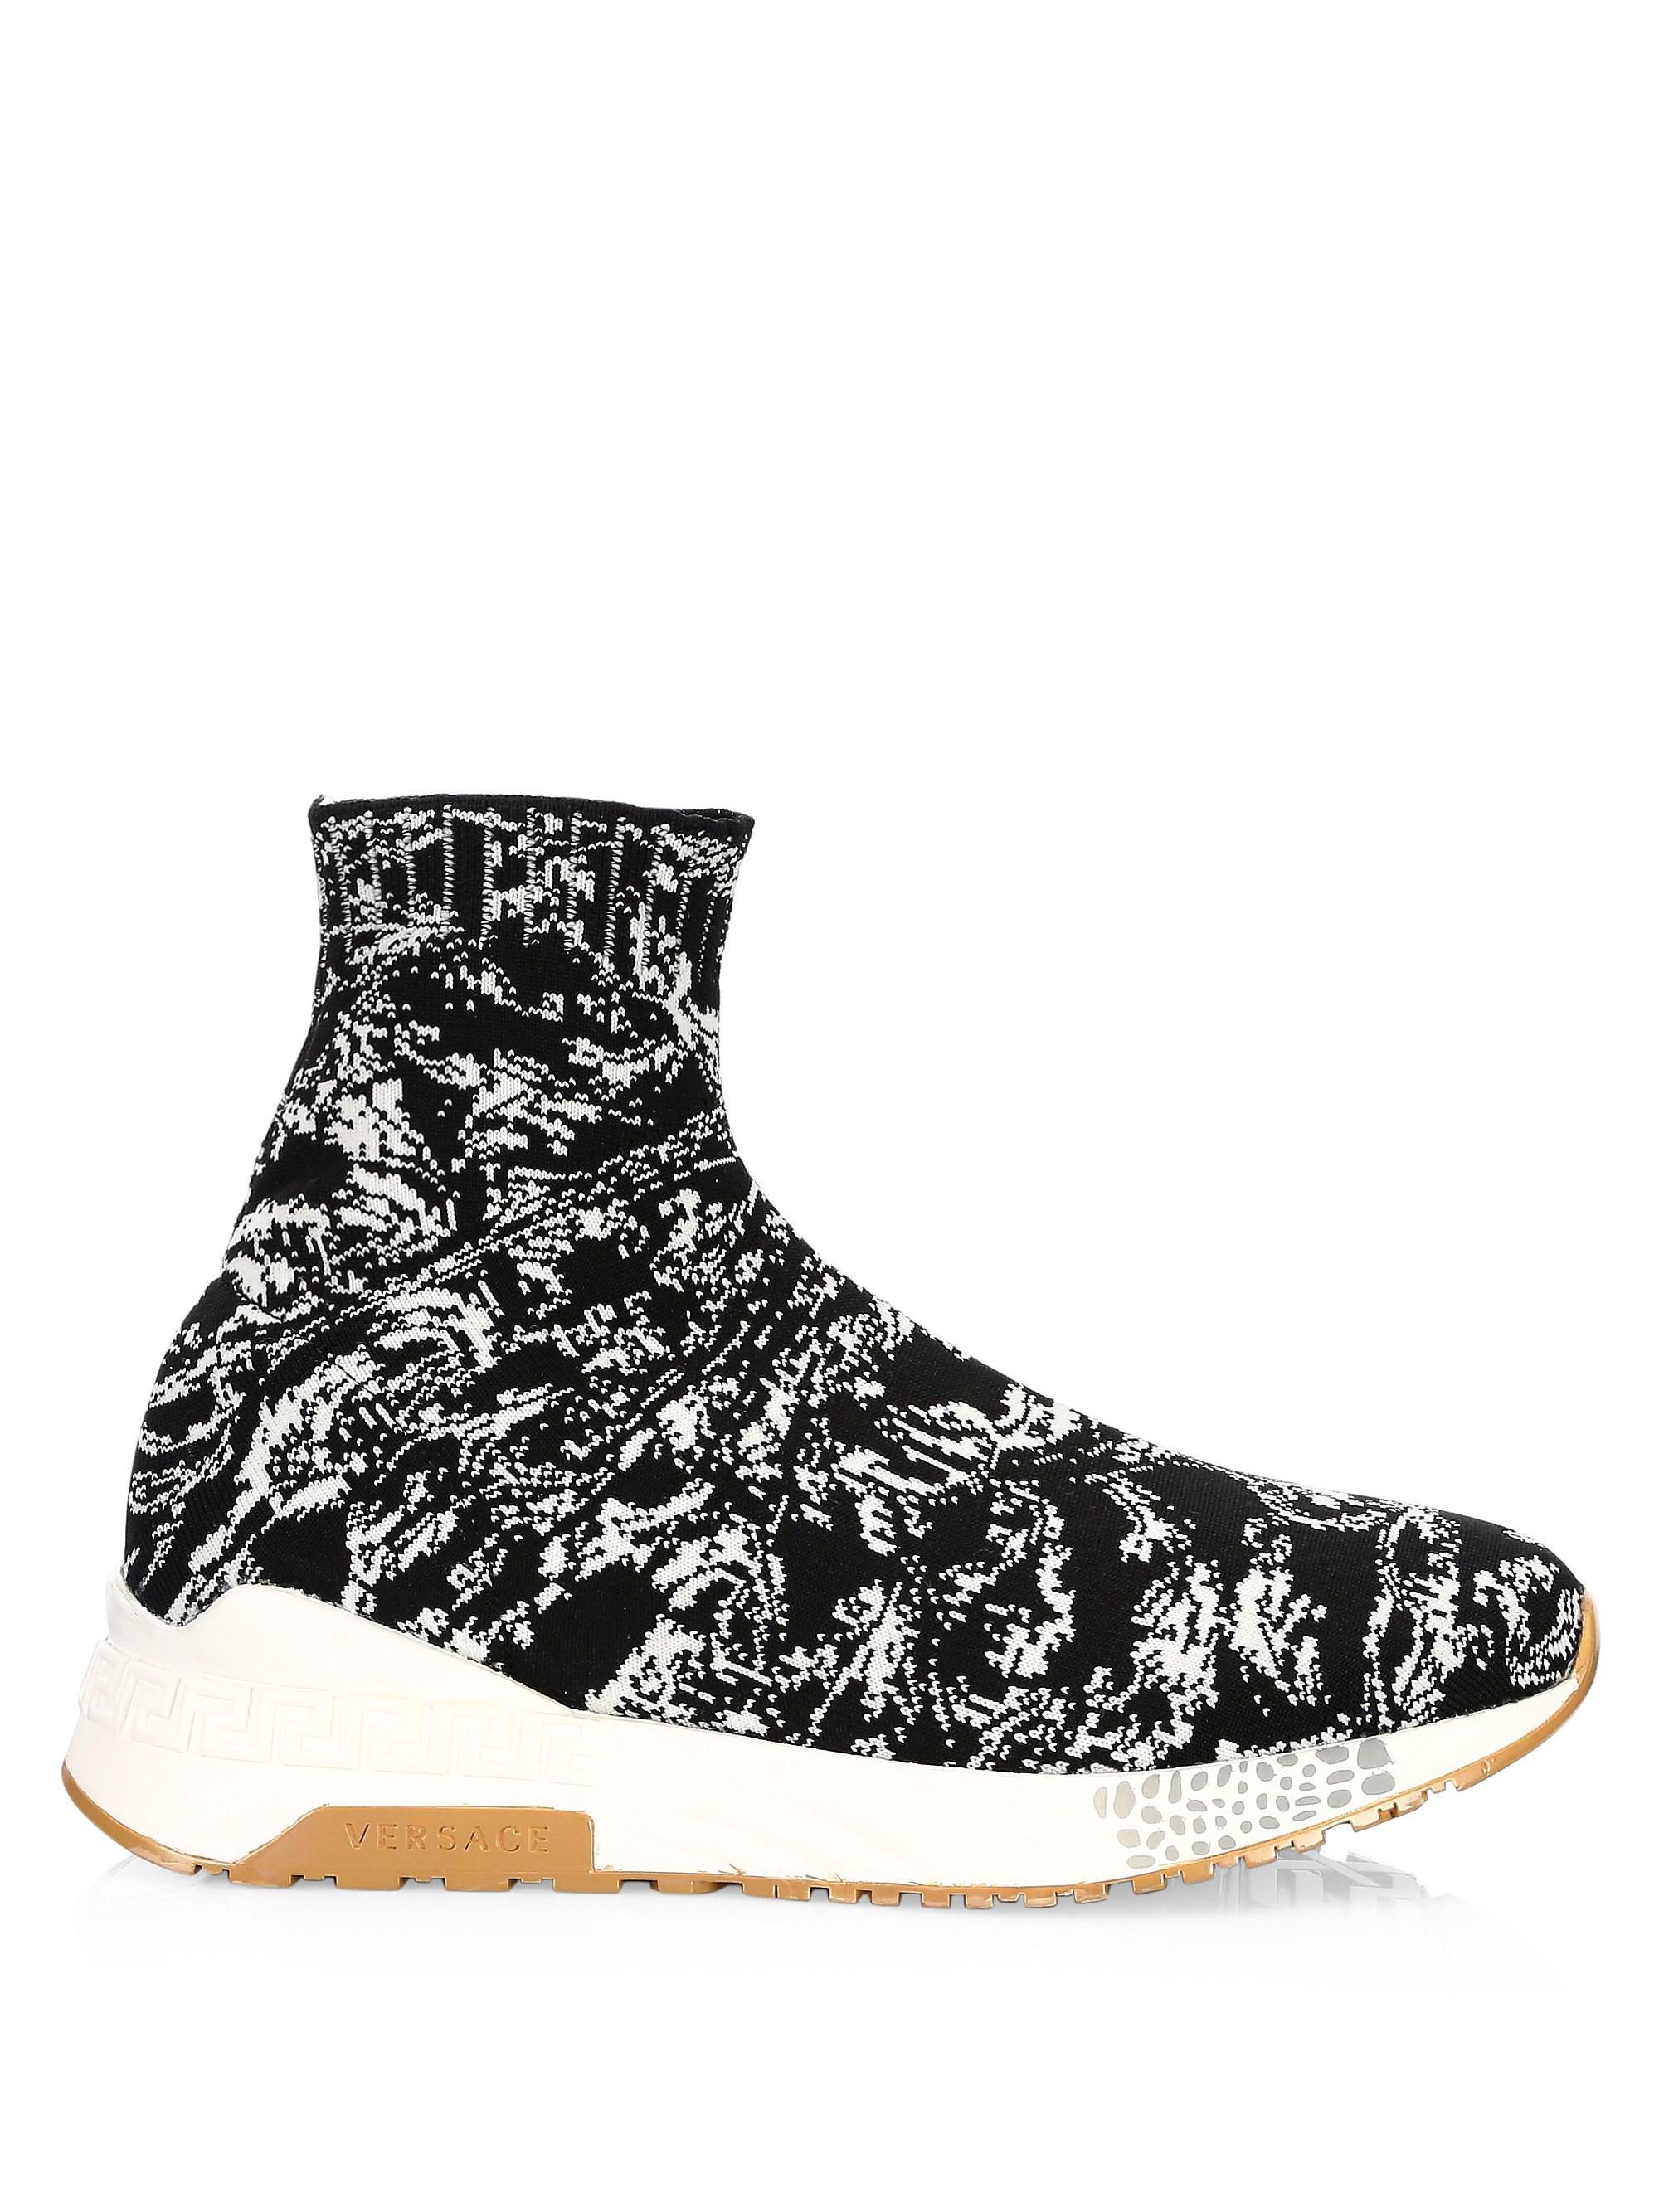 Baroque Knit Sock Sneakers in Black